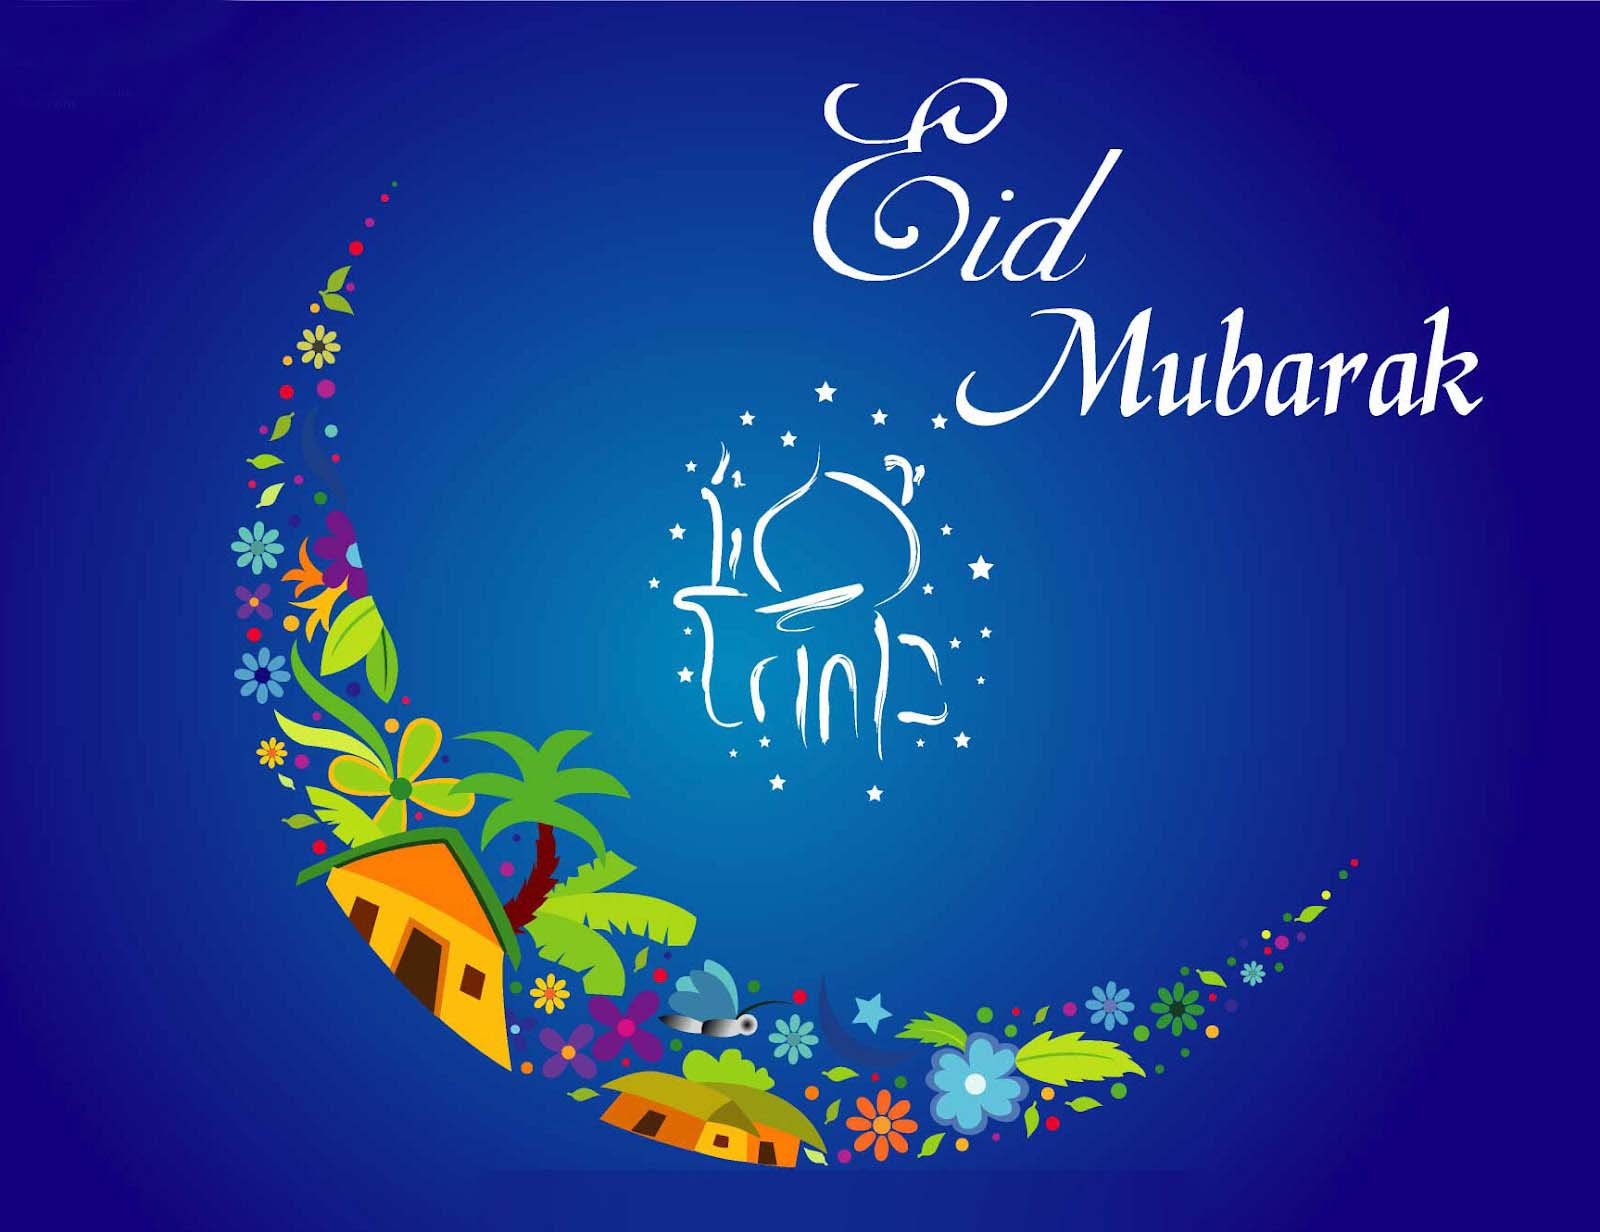 Happy Eid Mubarak Images Free Download 2018